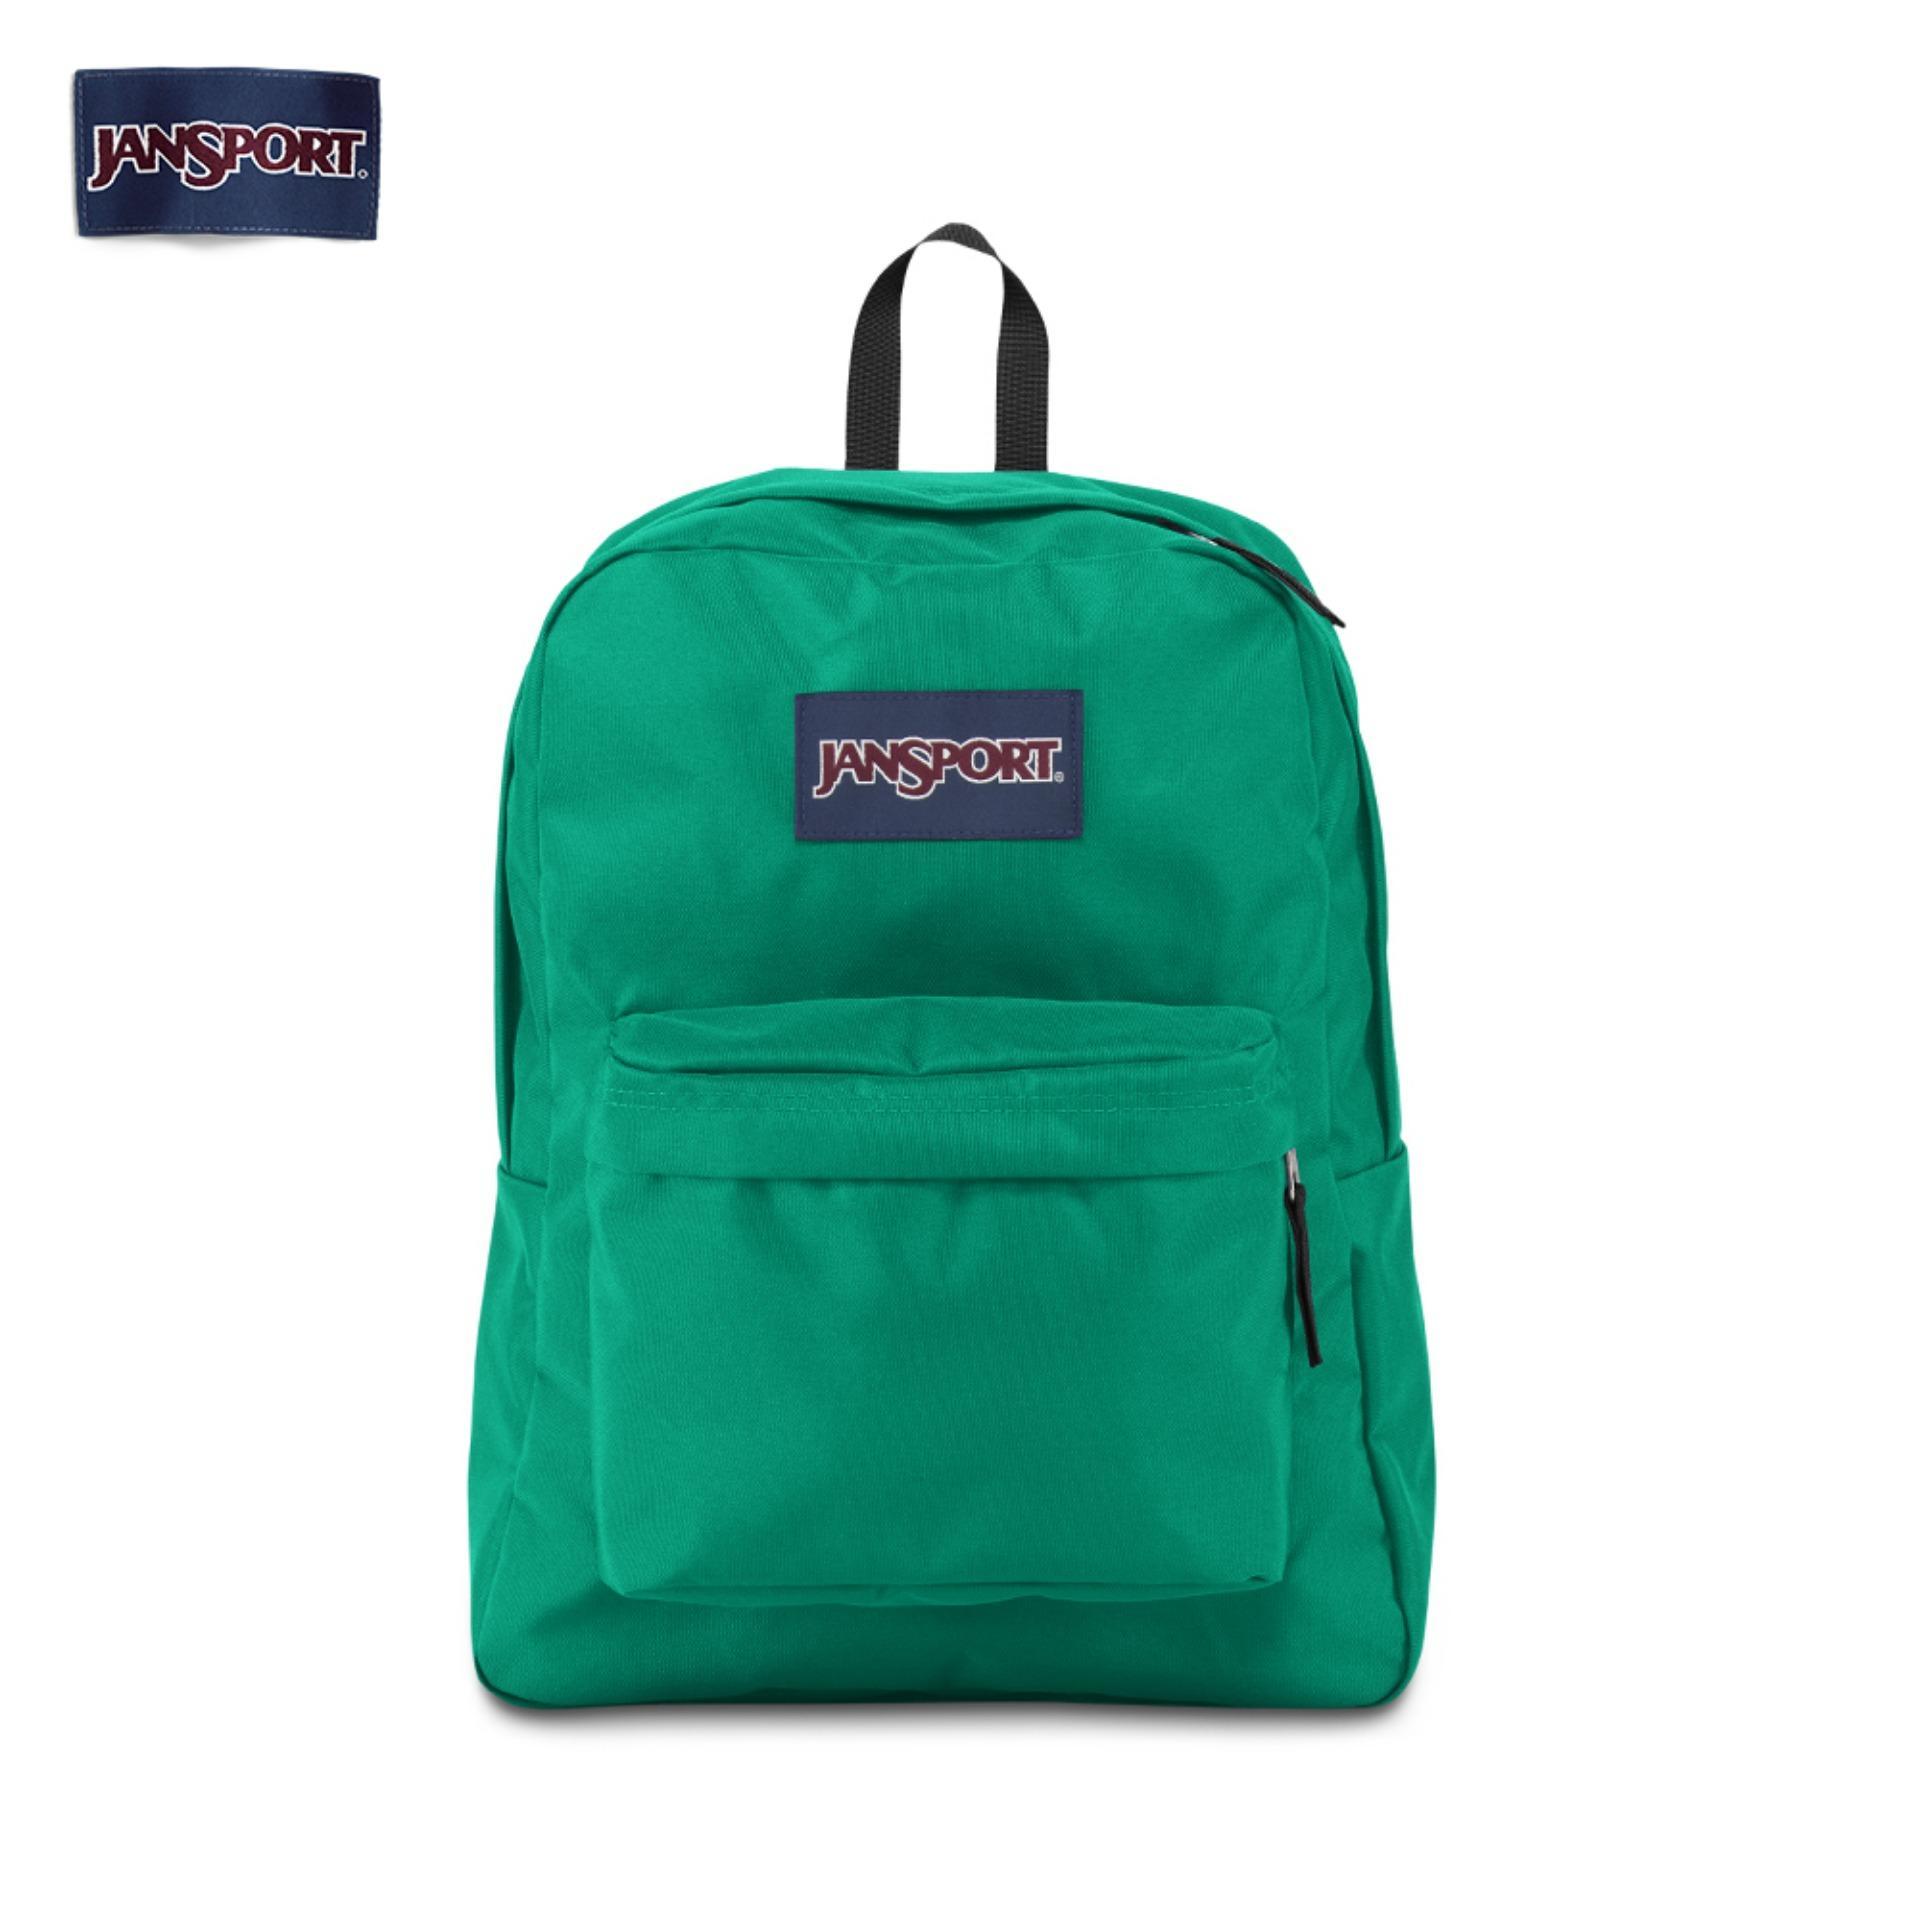 JanSport Philippines  JanSport price list - JanSport Bags ... a2bd0f0a4880a